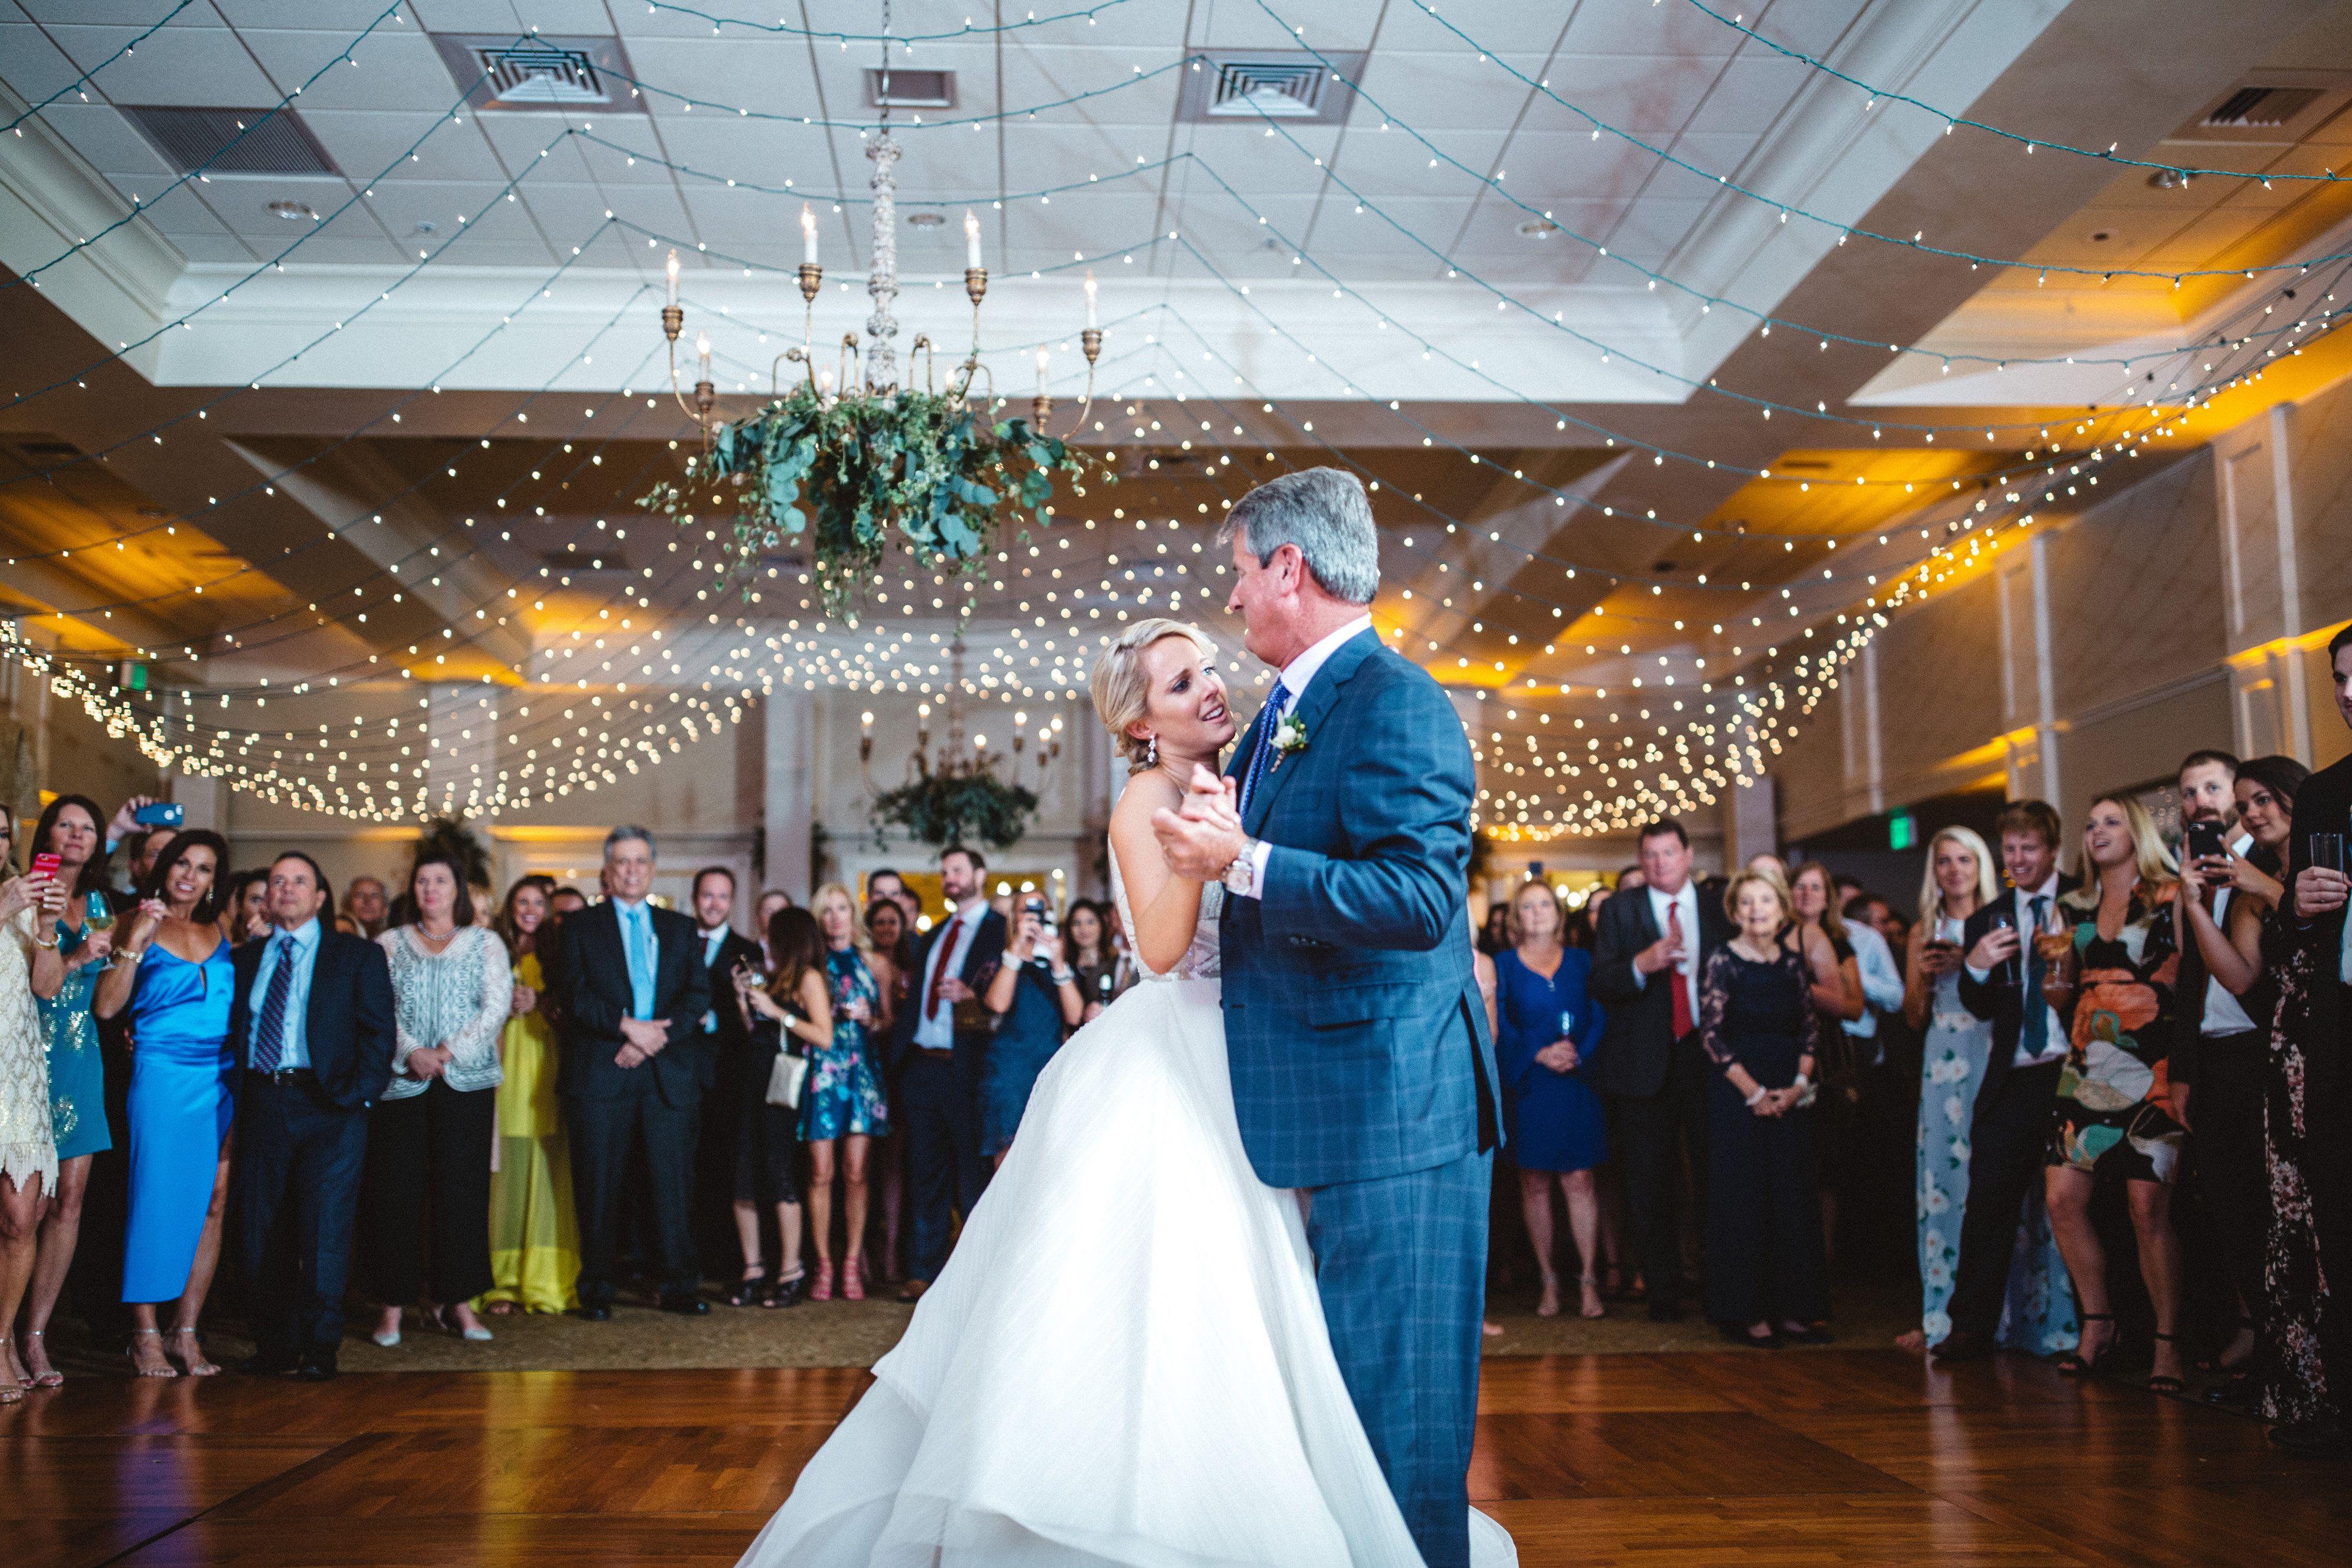 First dance amazing wedding lighting interlachen country club